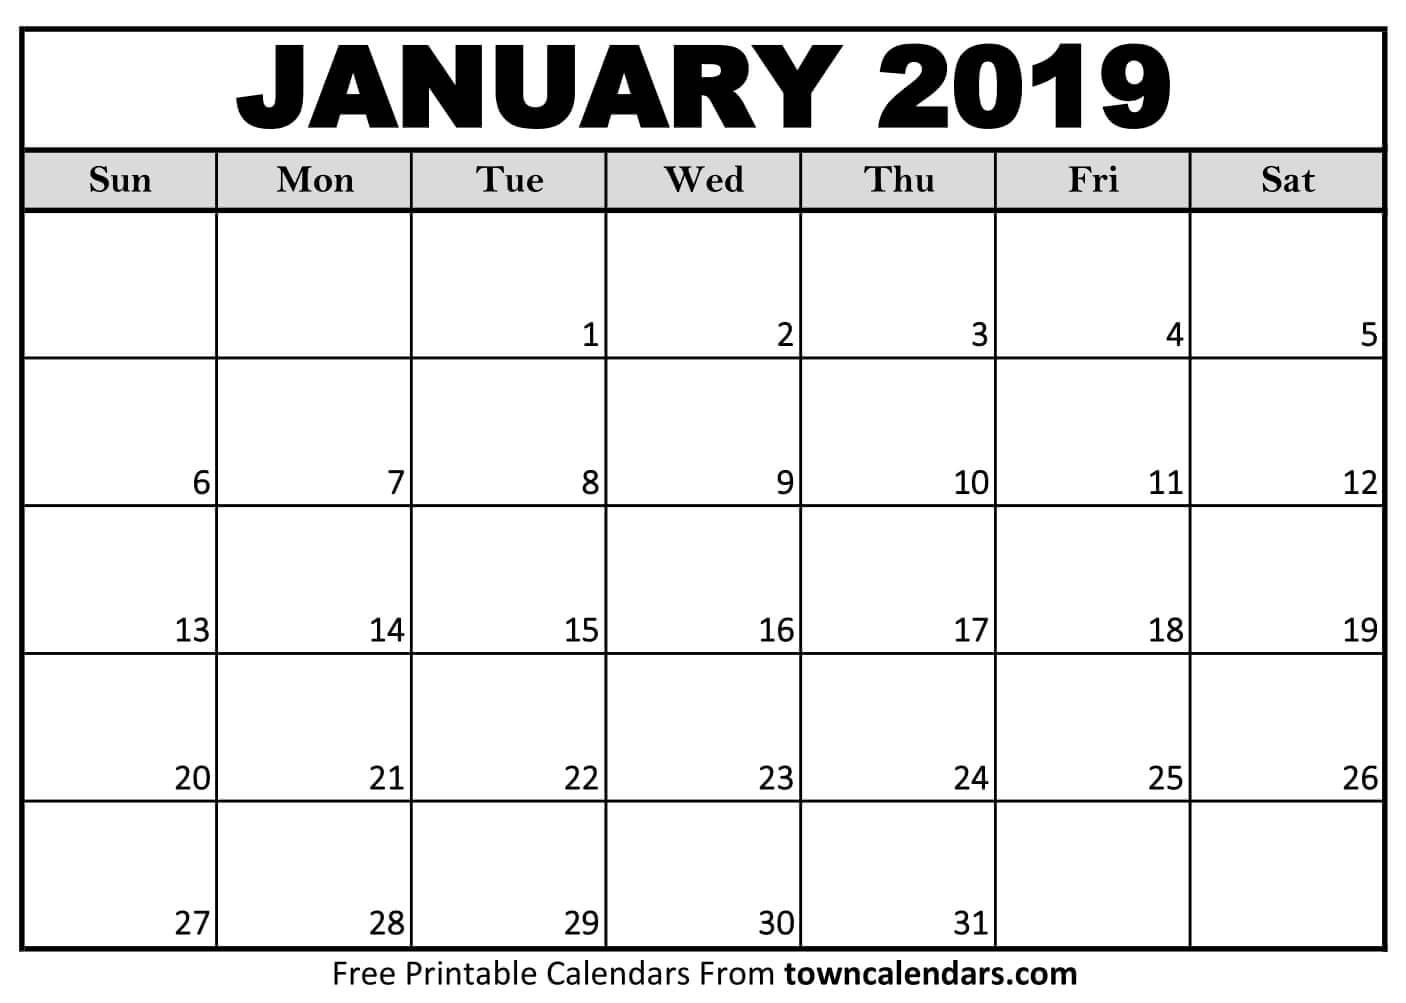 2019 Printable January Calendar